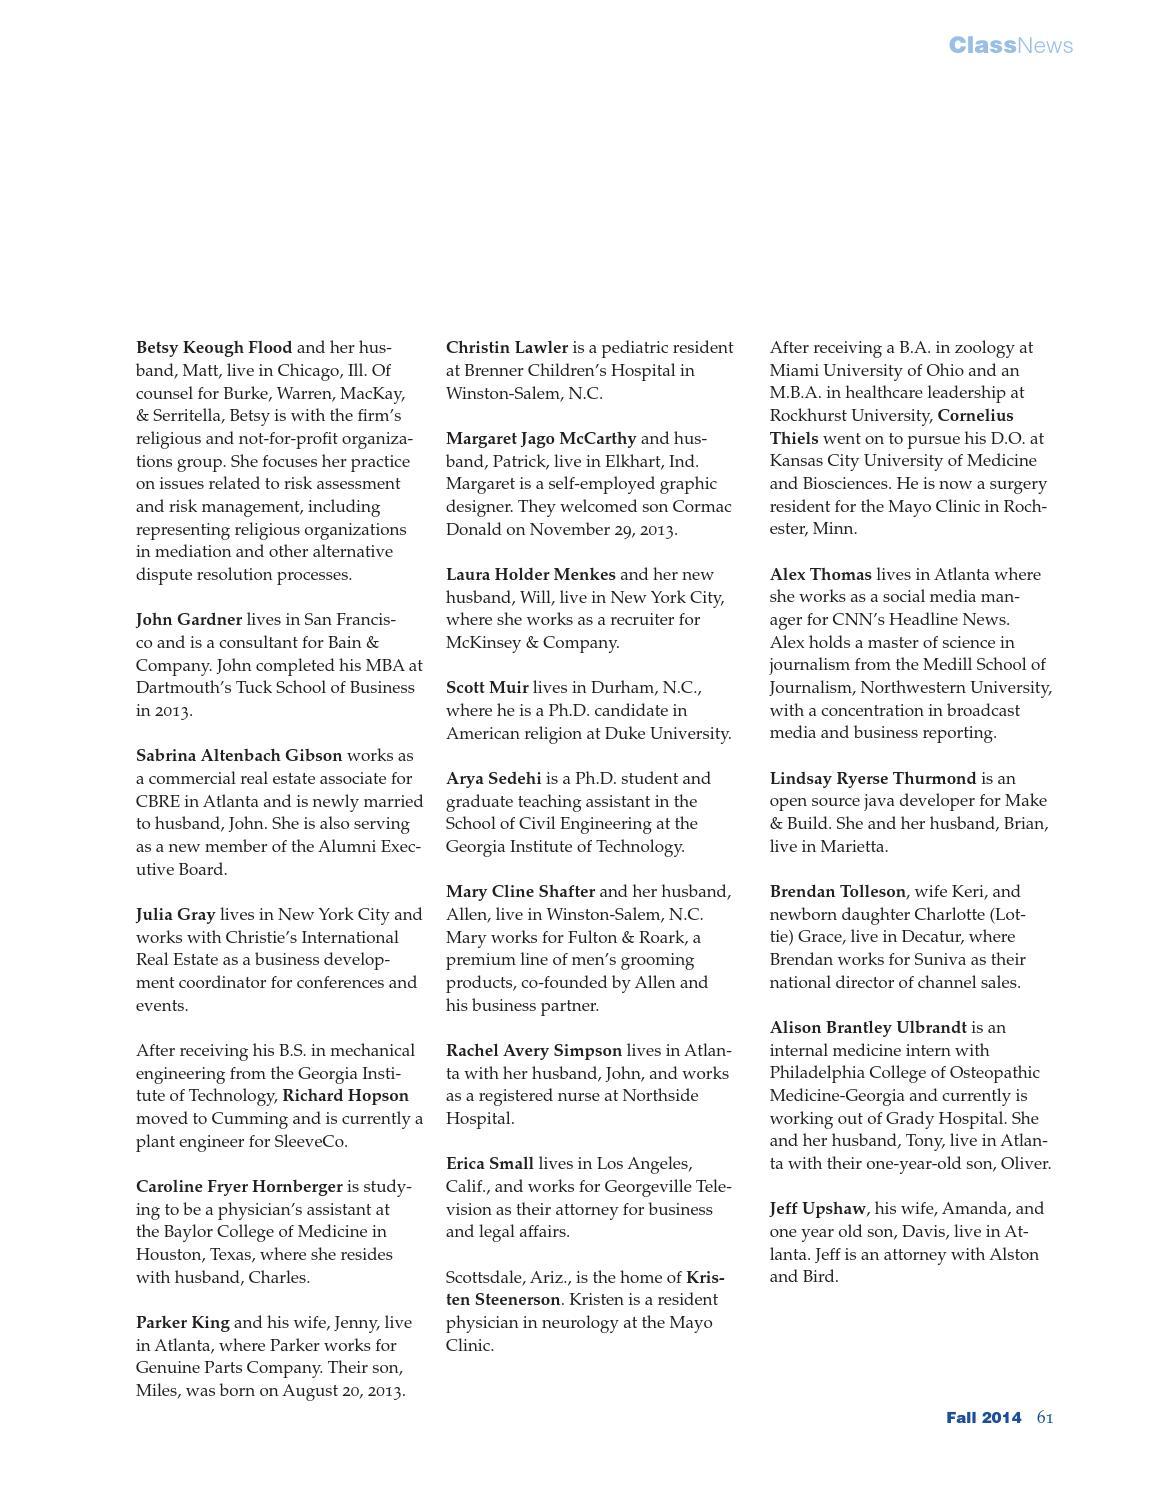 Lovett Magazine, Fall 2014 by The Lovett School - issuu